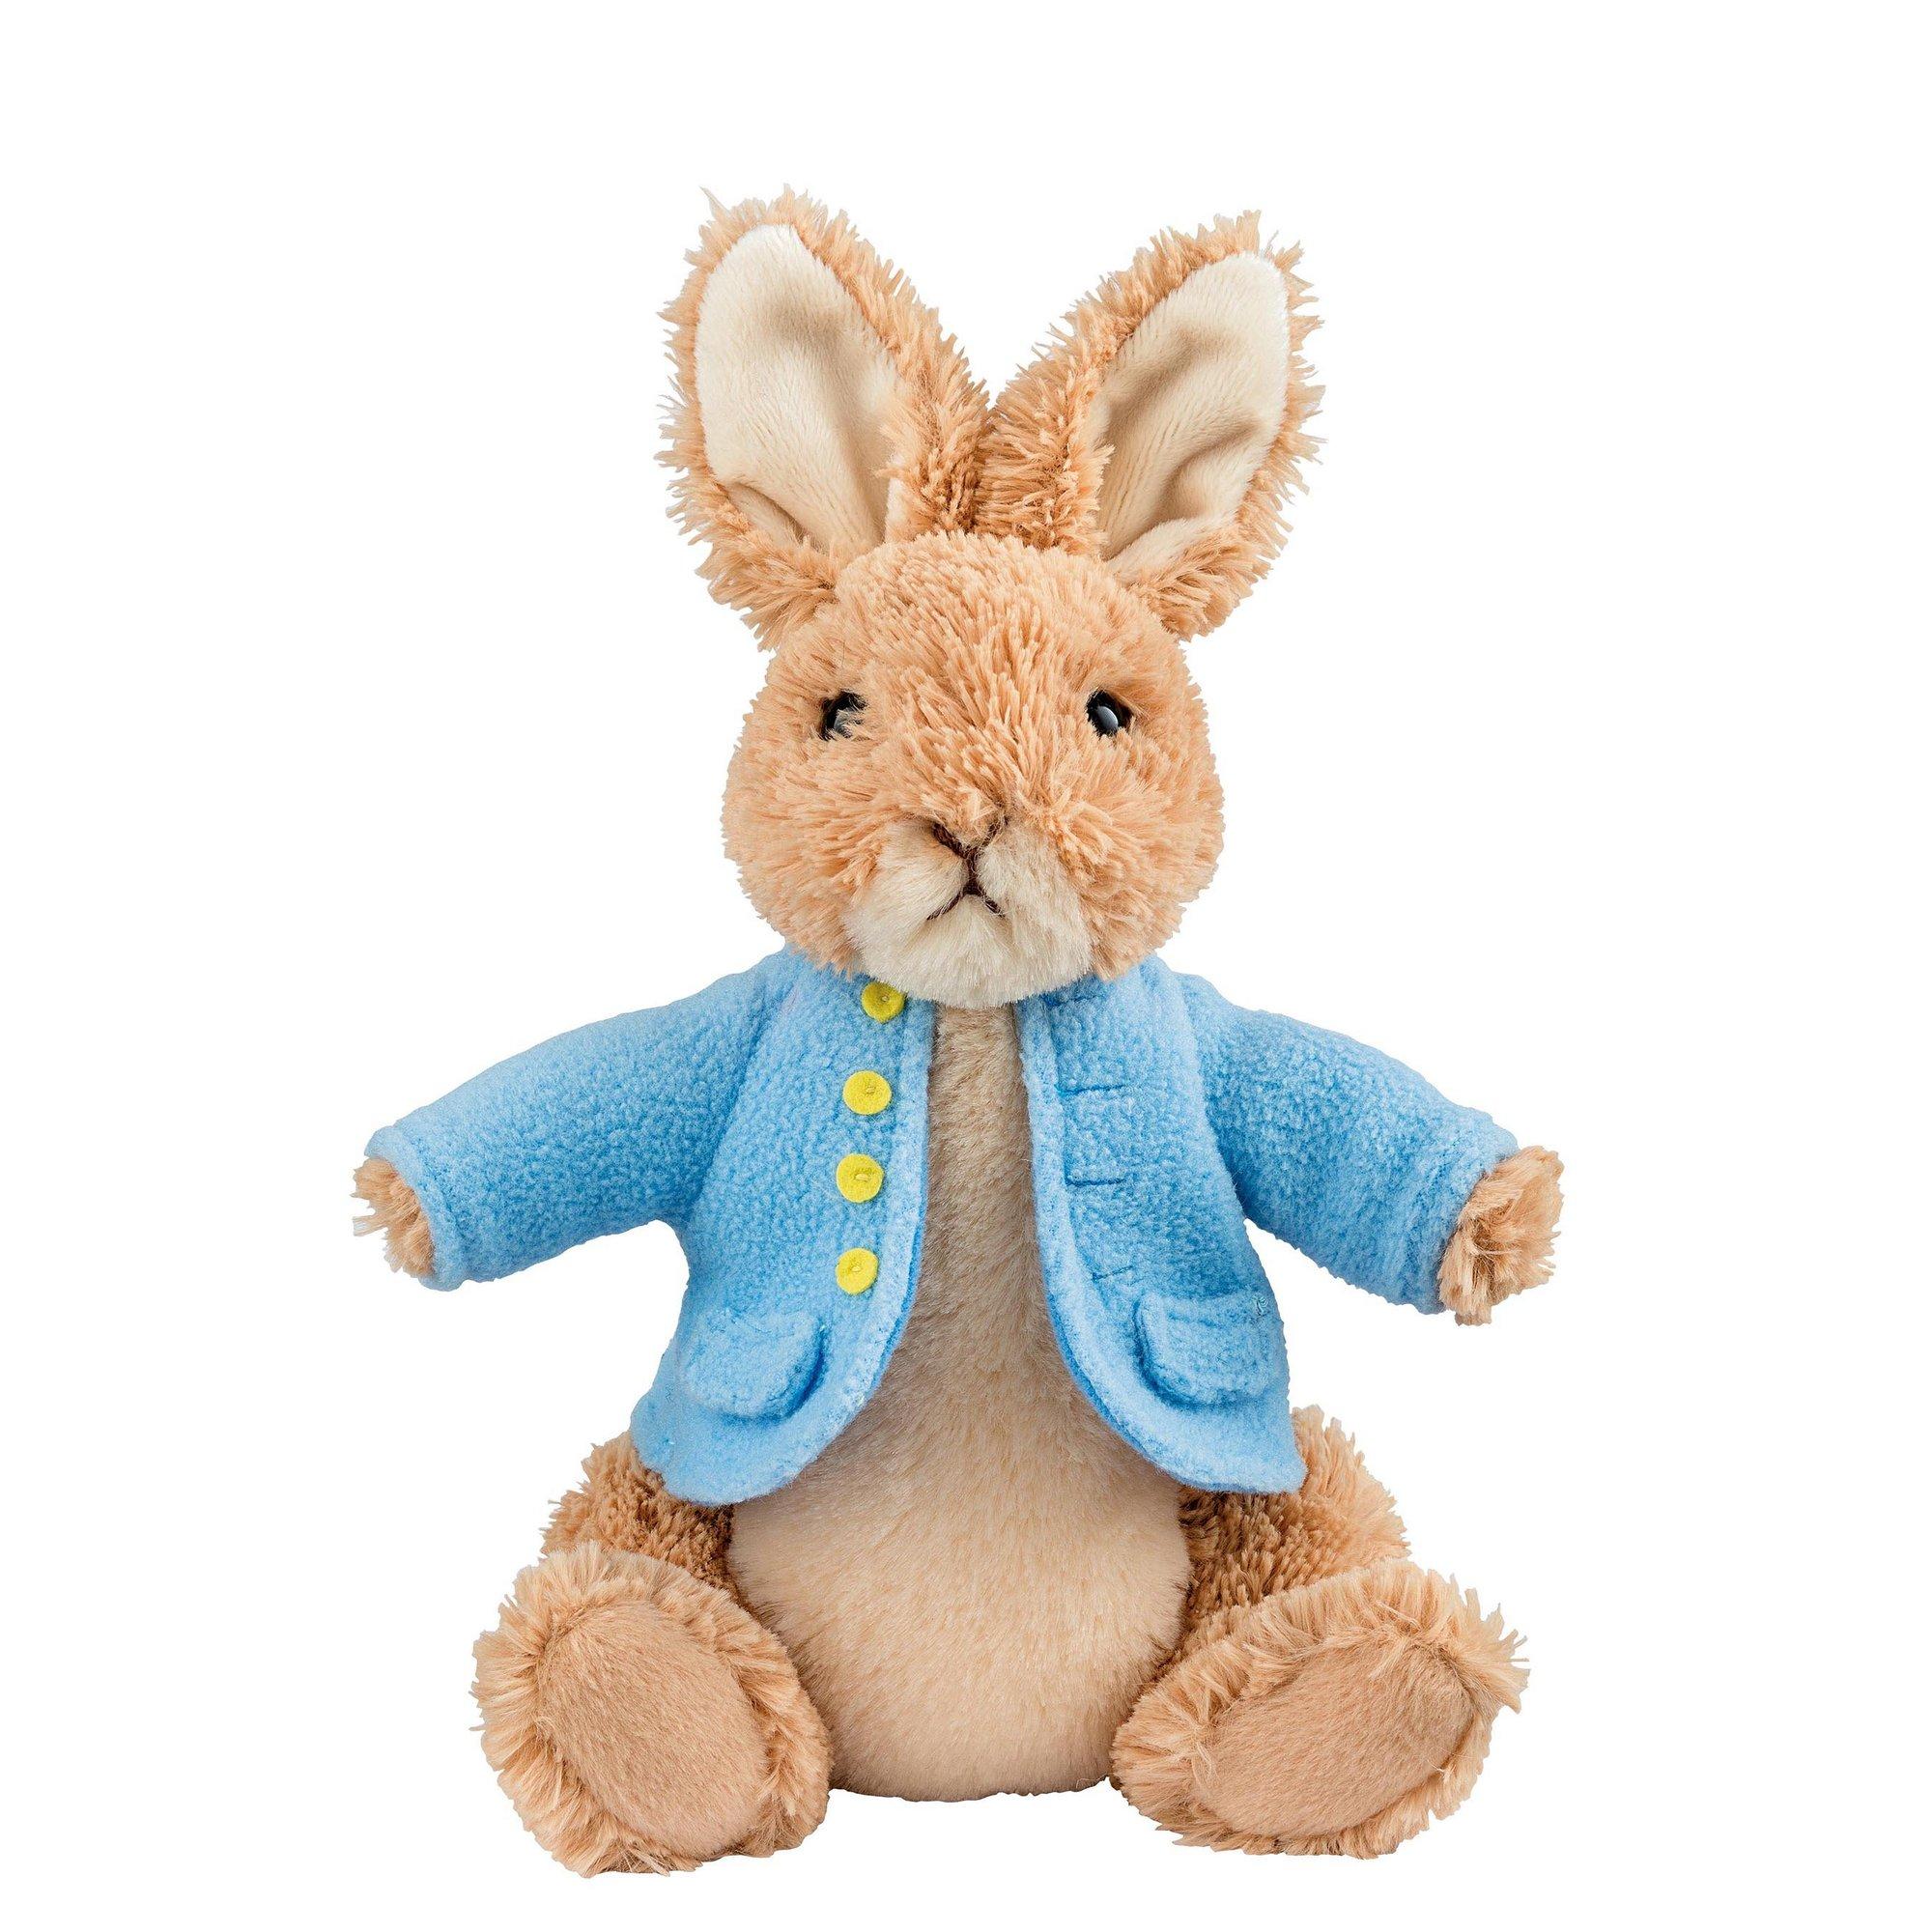 Image of Beatrix Potter Medium Peter Rabbit